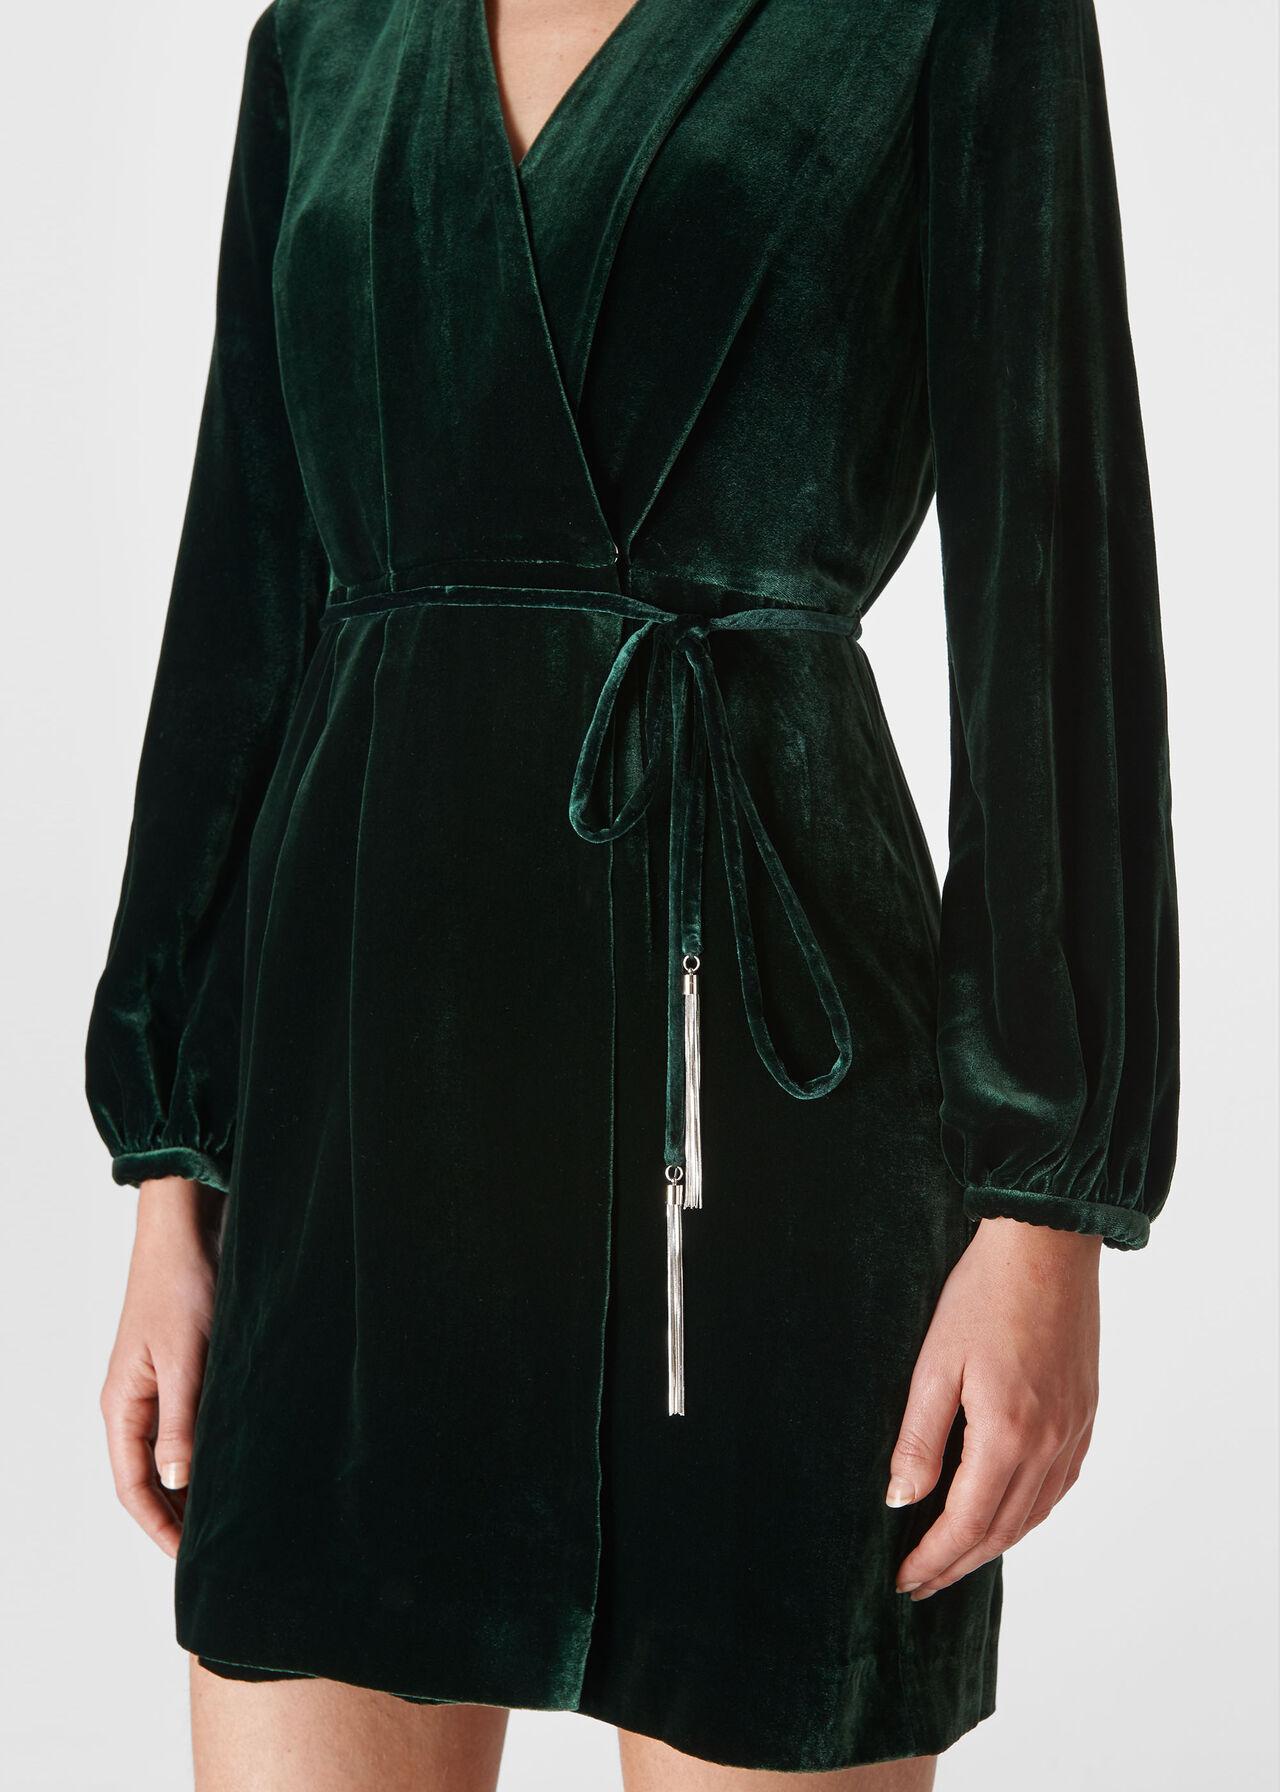 Lavone Silk Mix Velvet Dress Dark Green